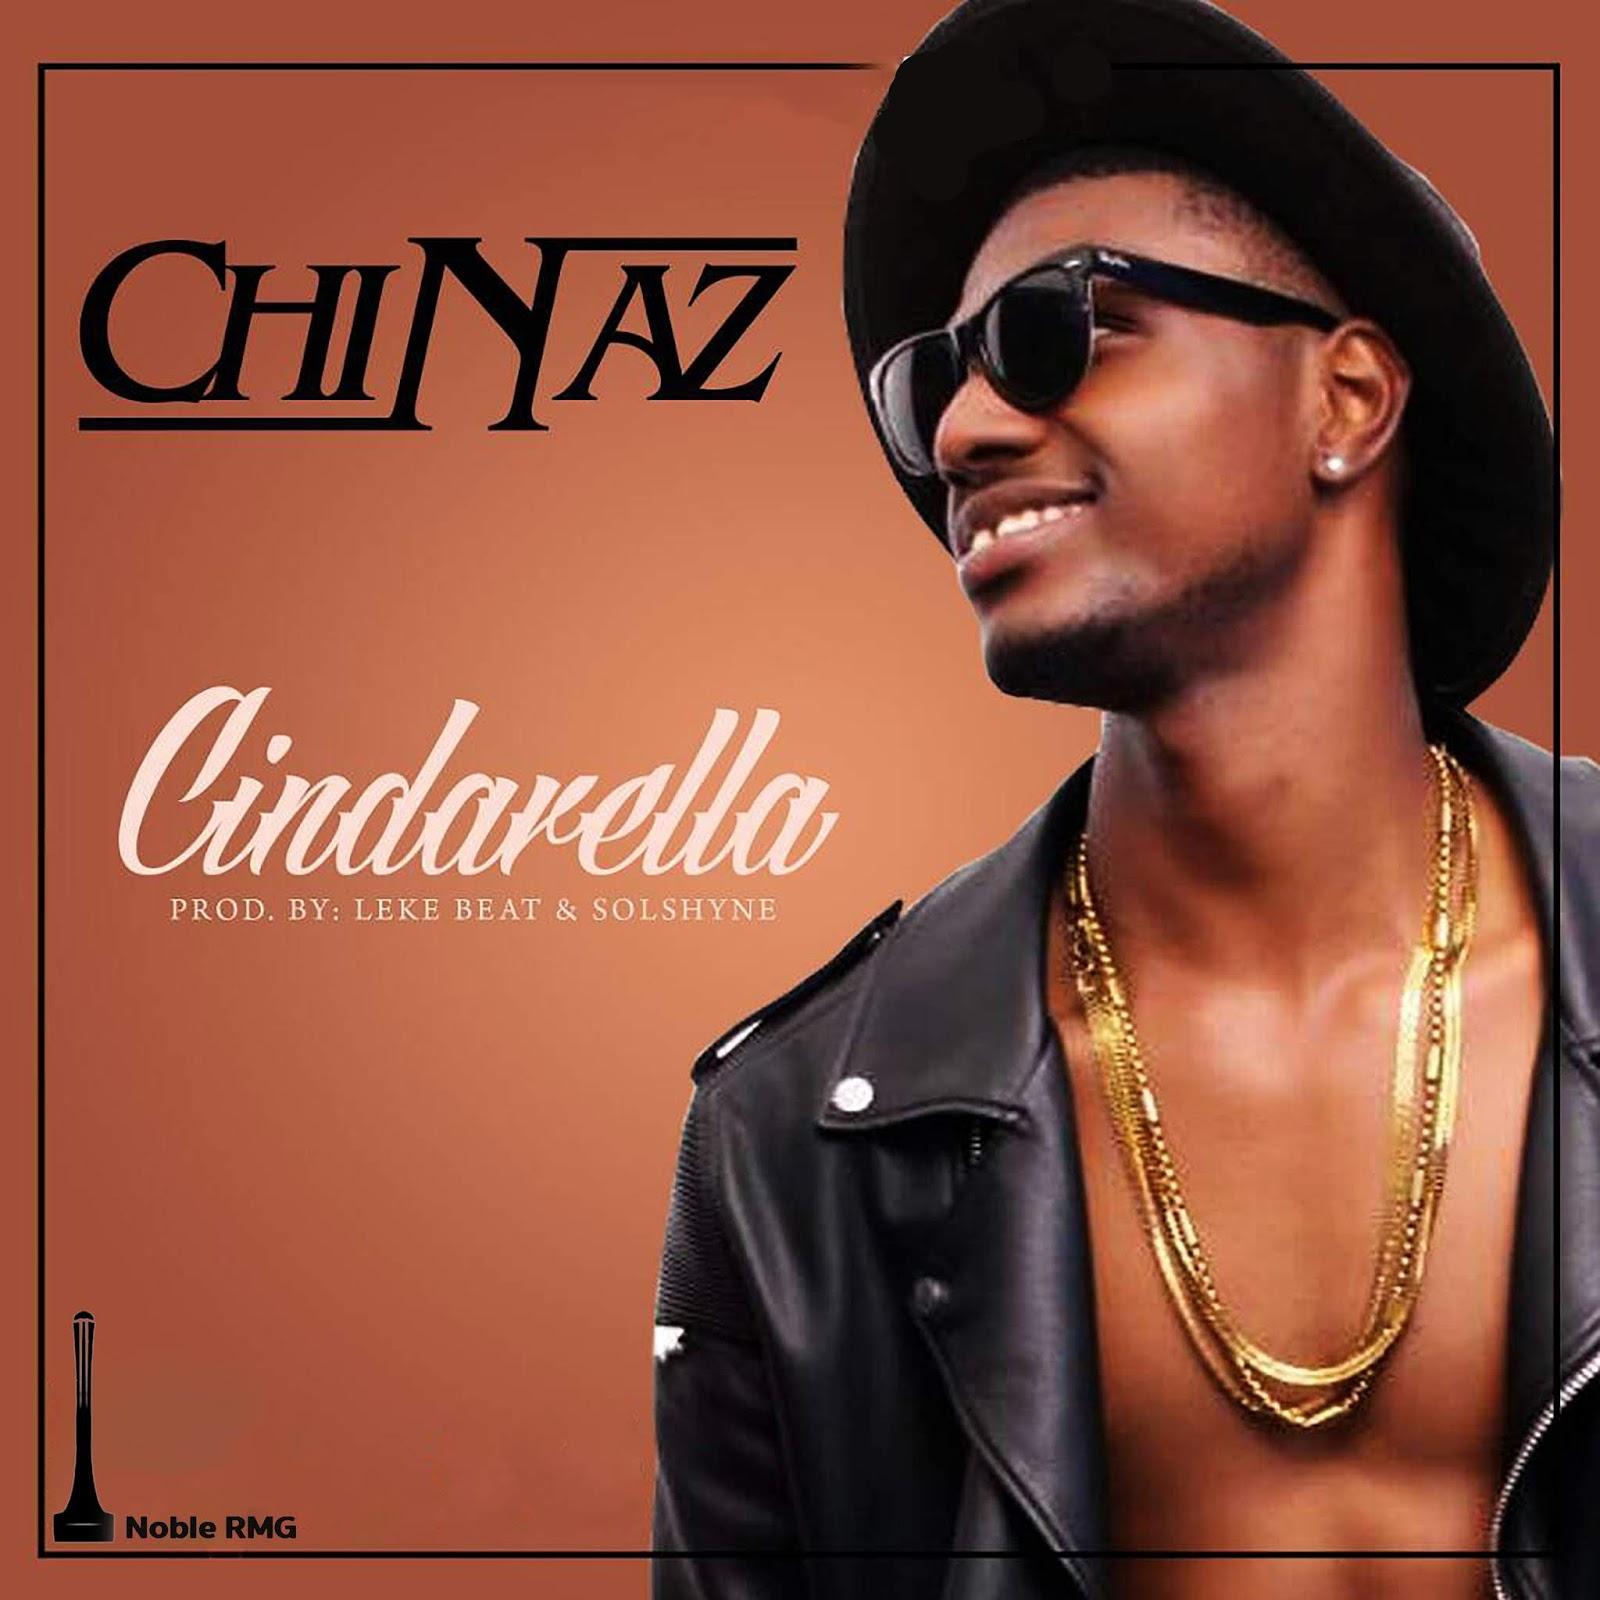 Chinaz – Cindarella  + Chinaz Ft Vt & Dewz – Level